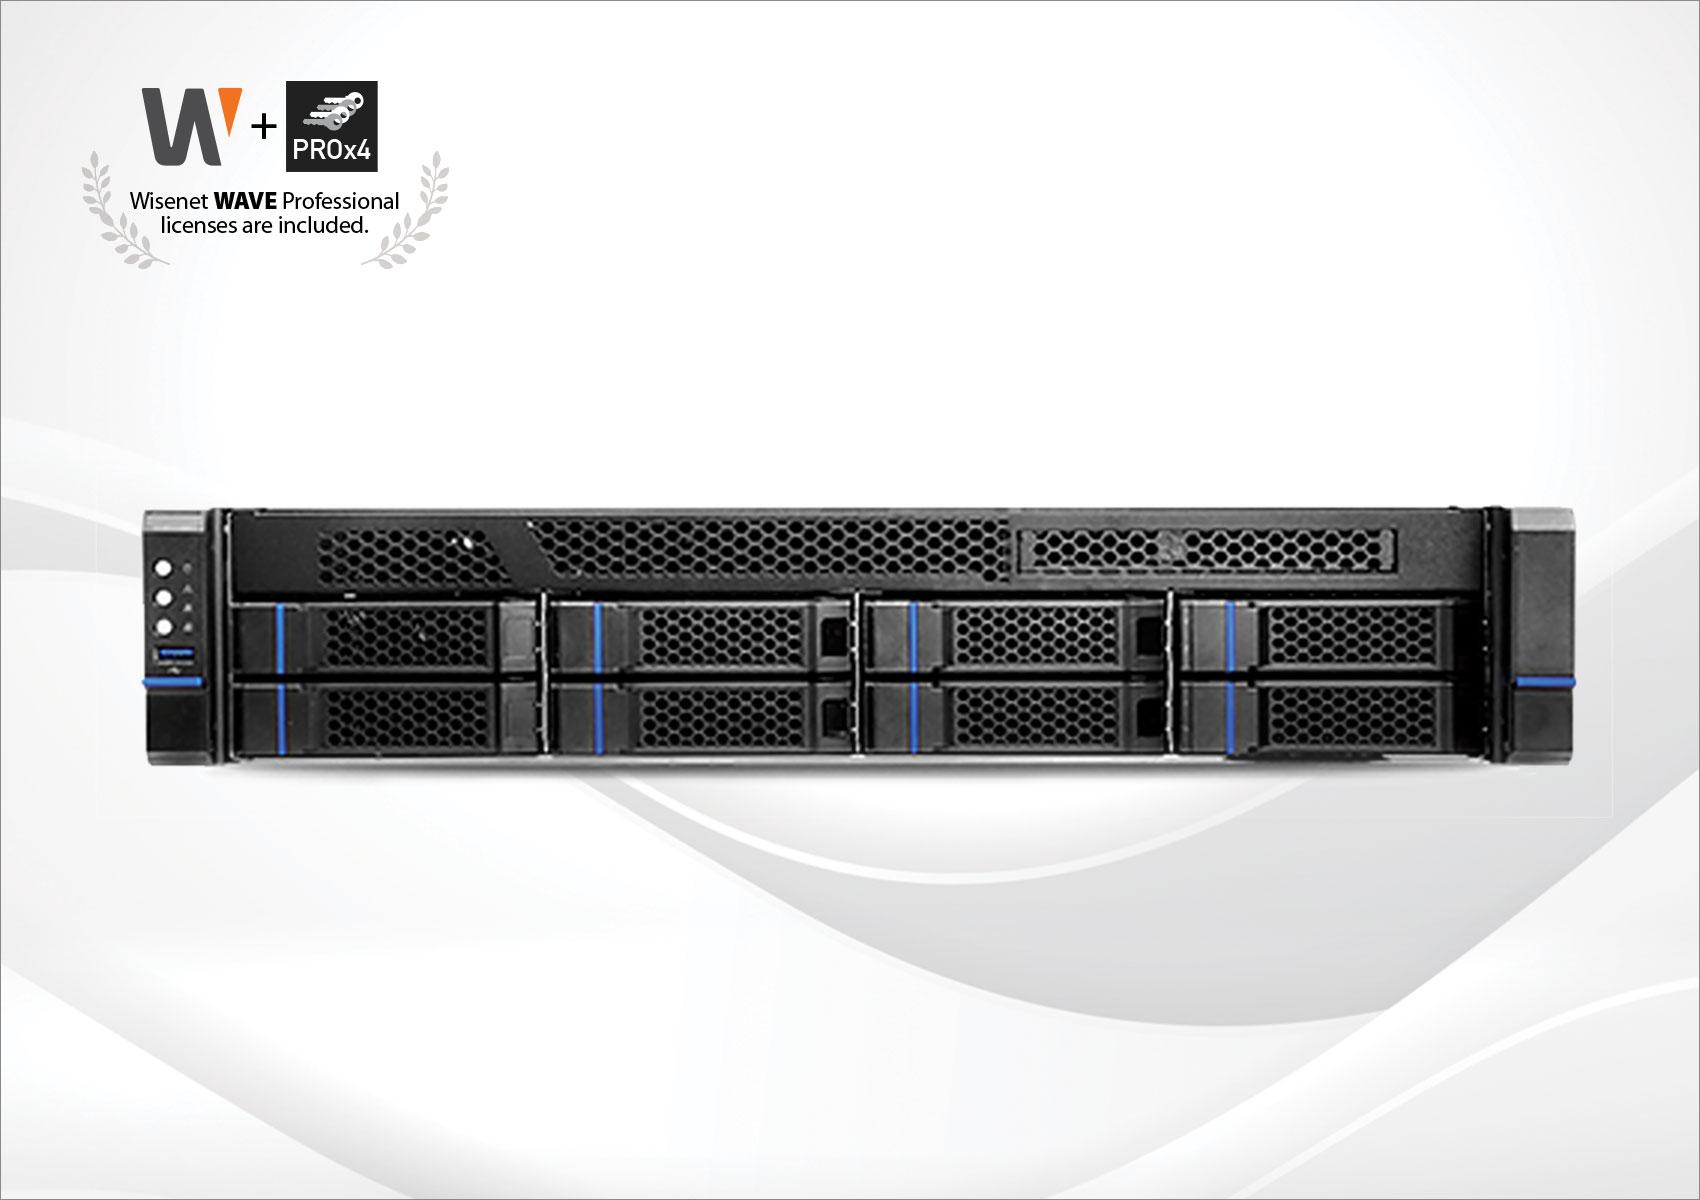 p-wrr5301-1